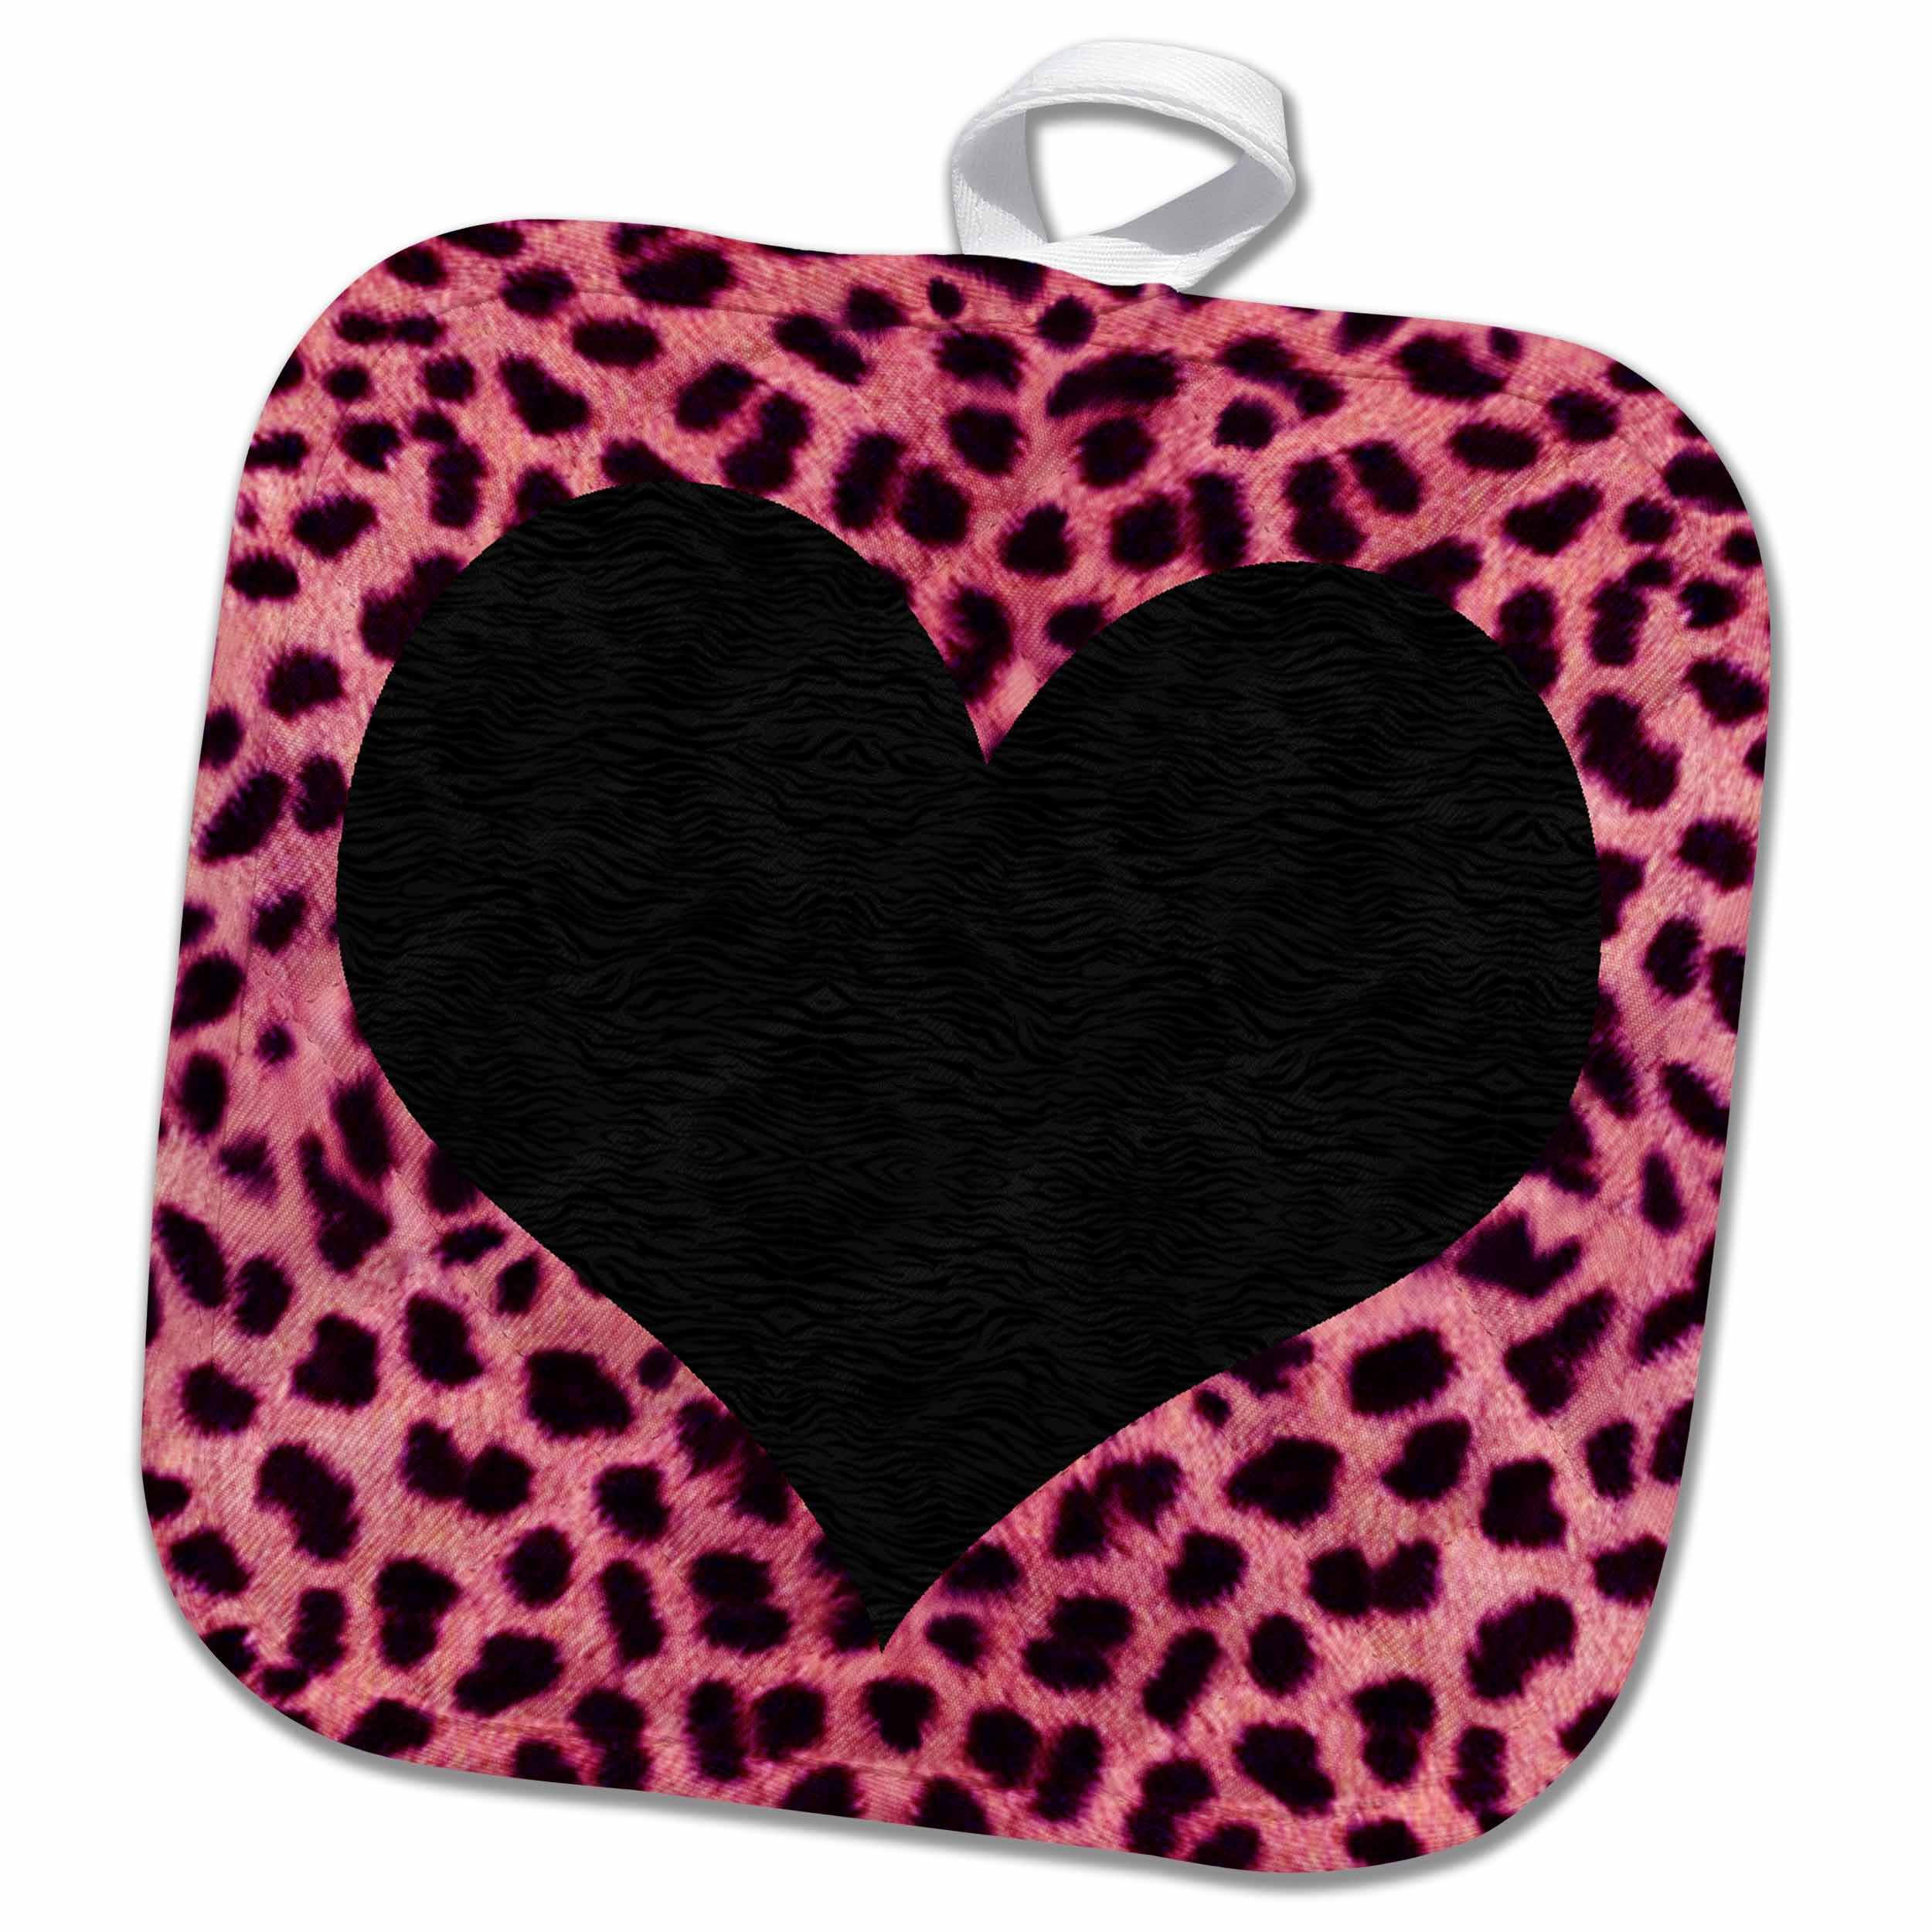 3dRose Punk Rockabilly Pink Cheetah Animal Print Black Heart Pot Holder, 8 x 8, White